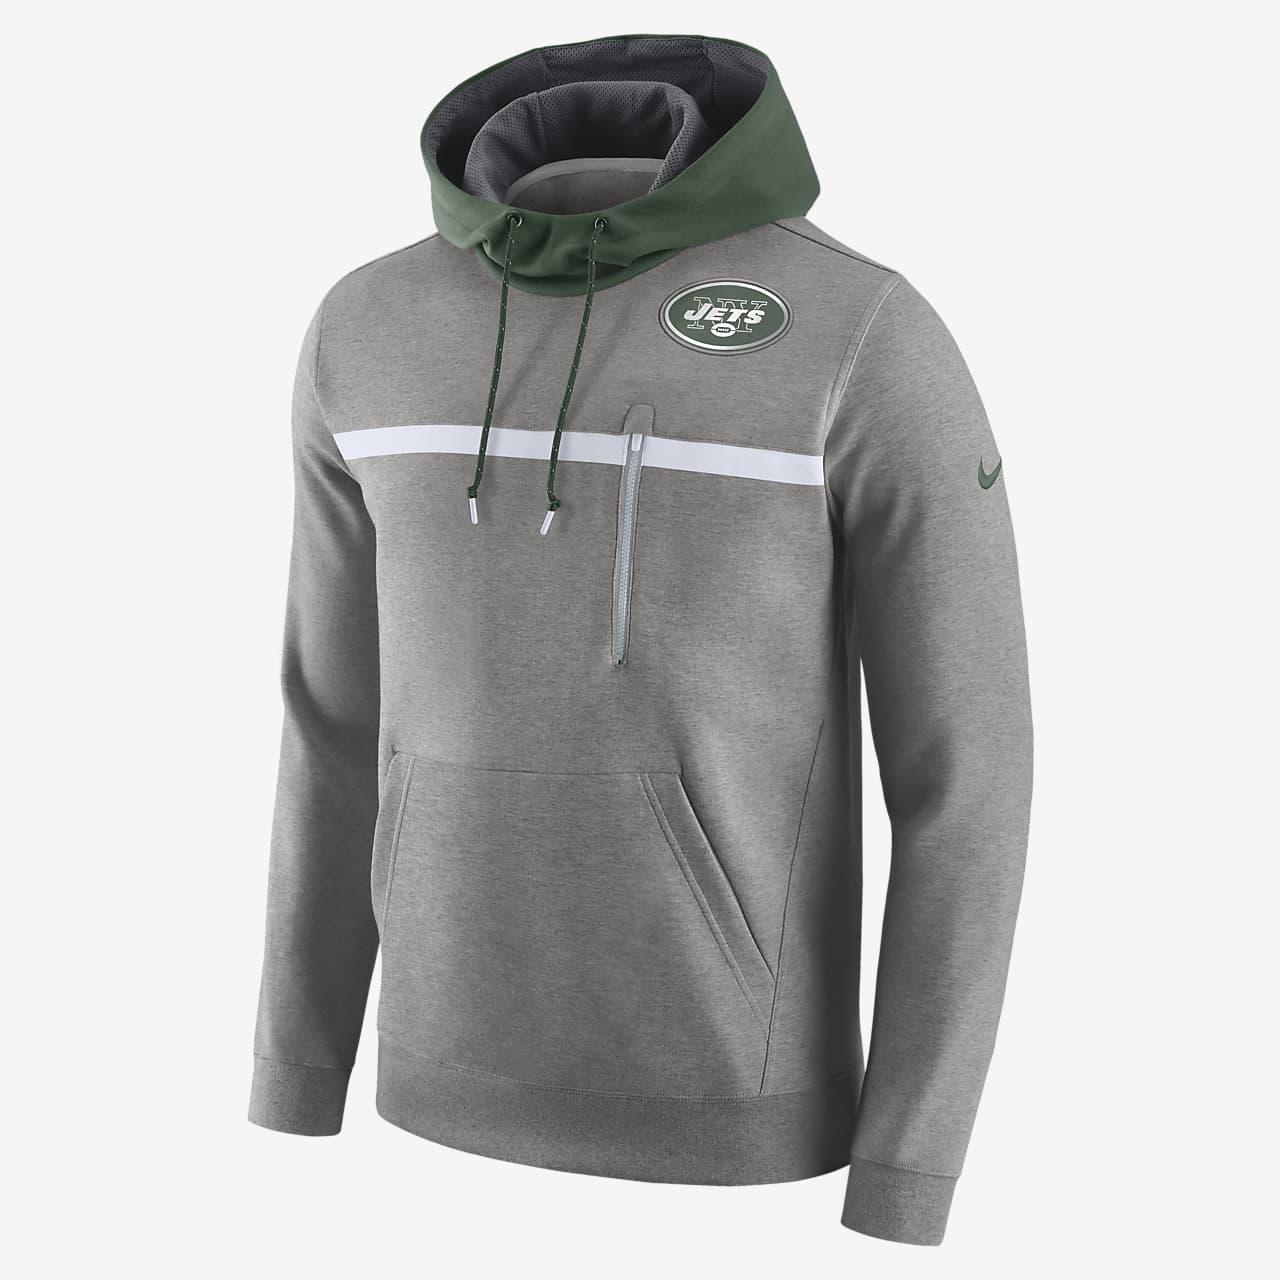 Nike Championship Drive Sweatshirt (NFL Jets) Men's Hoodie